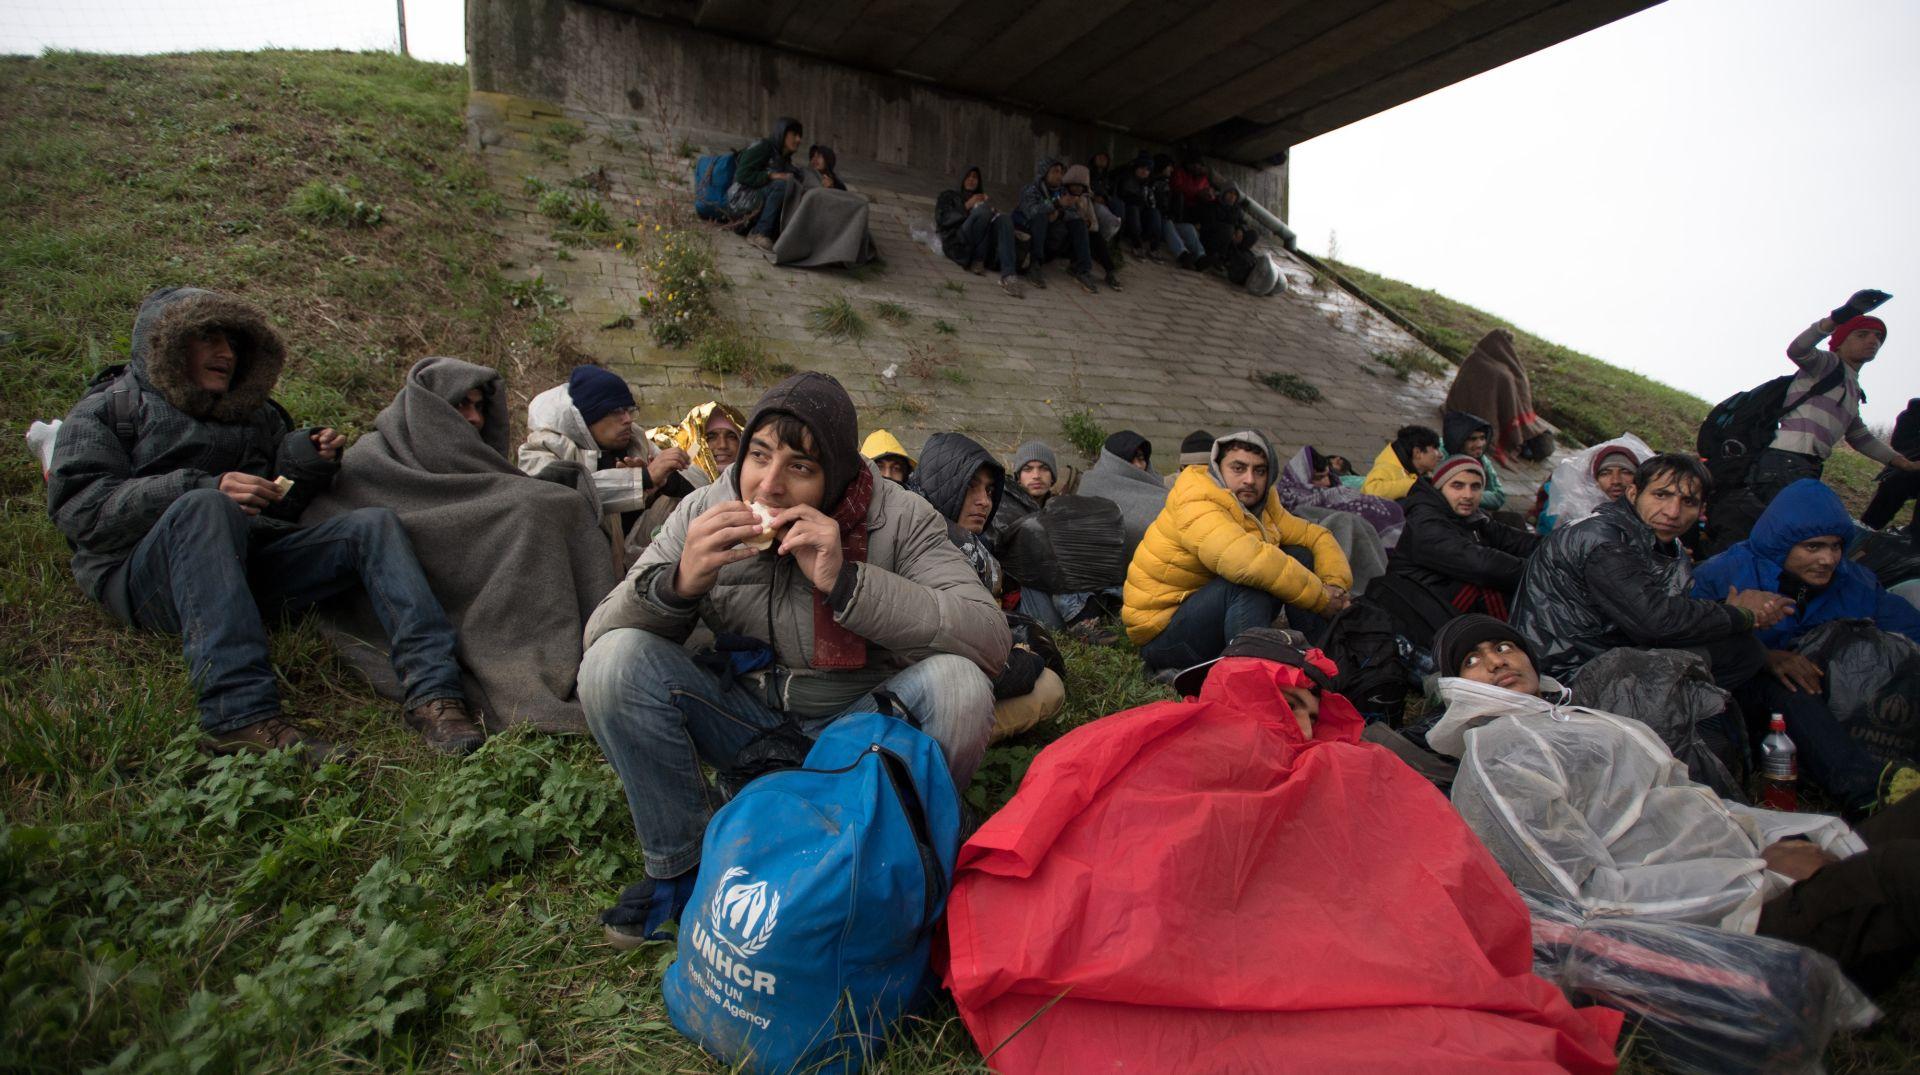 UNHCR Balkanske zemlje ilegalno vraćaju migrante